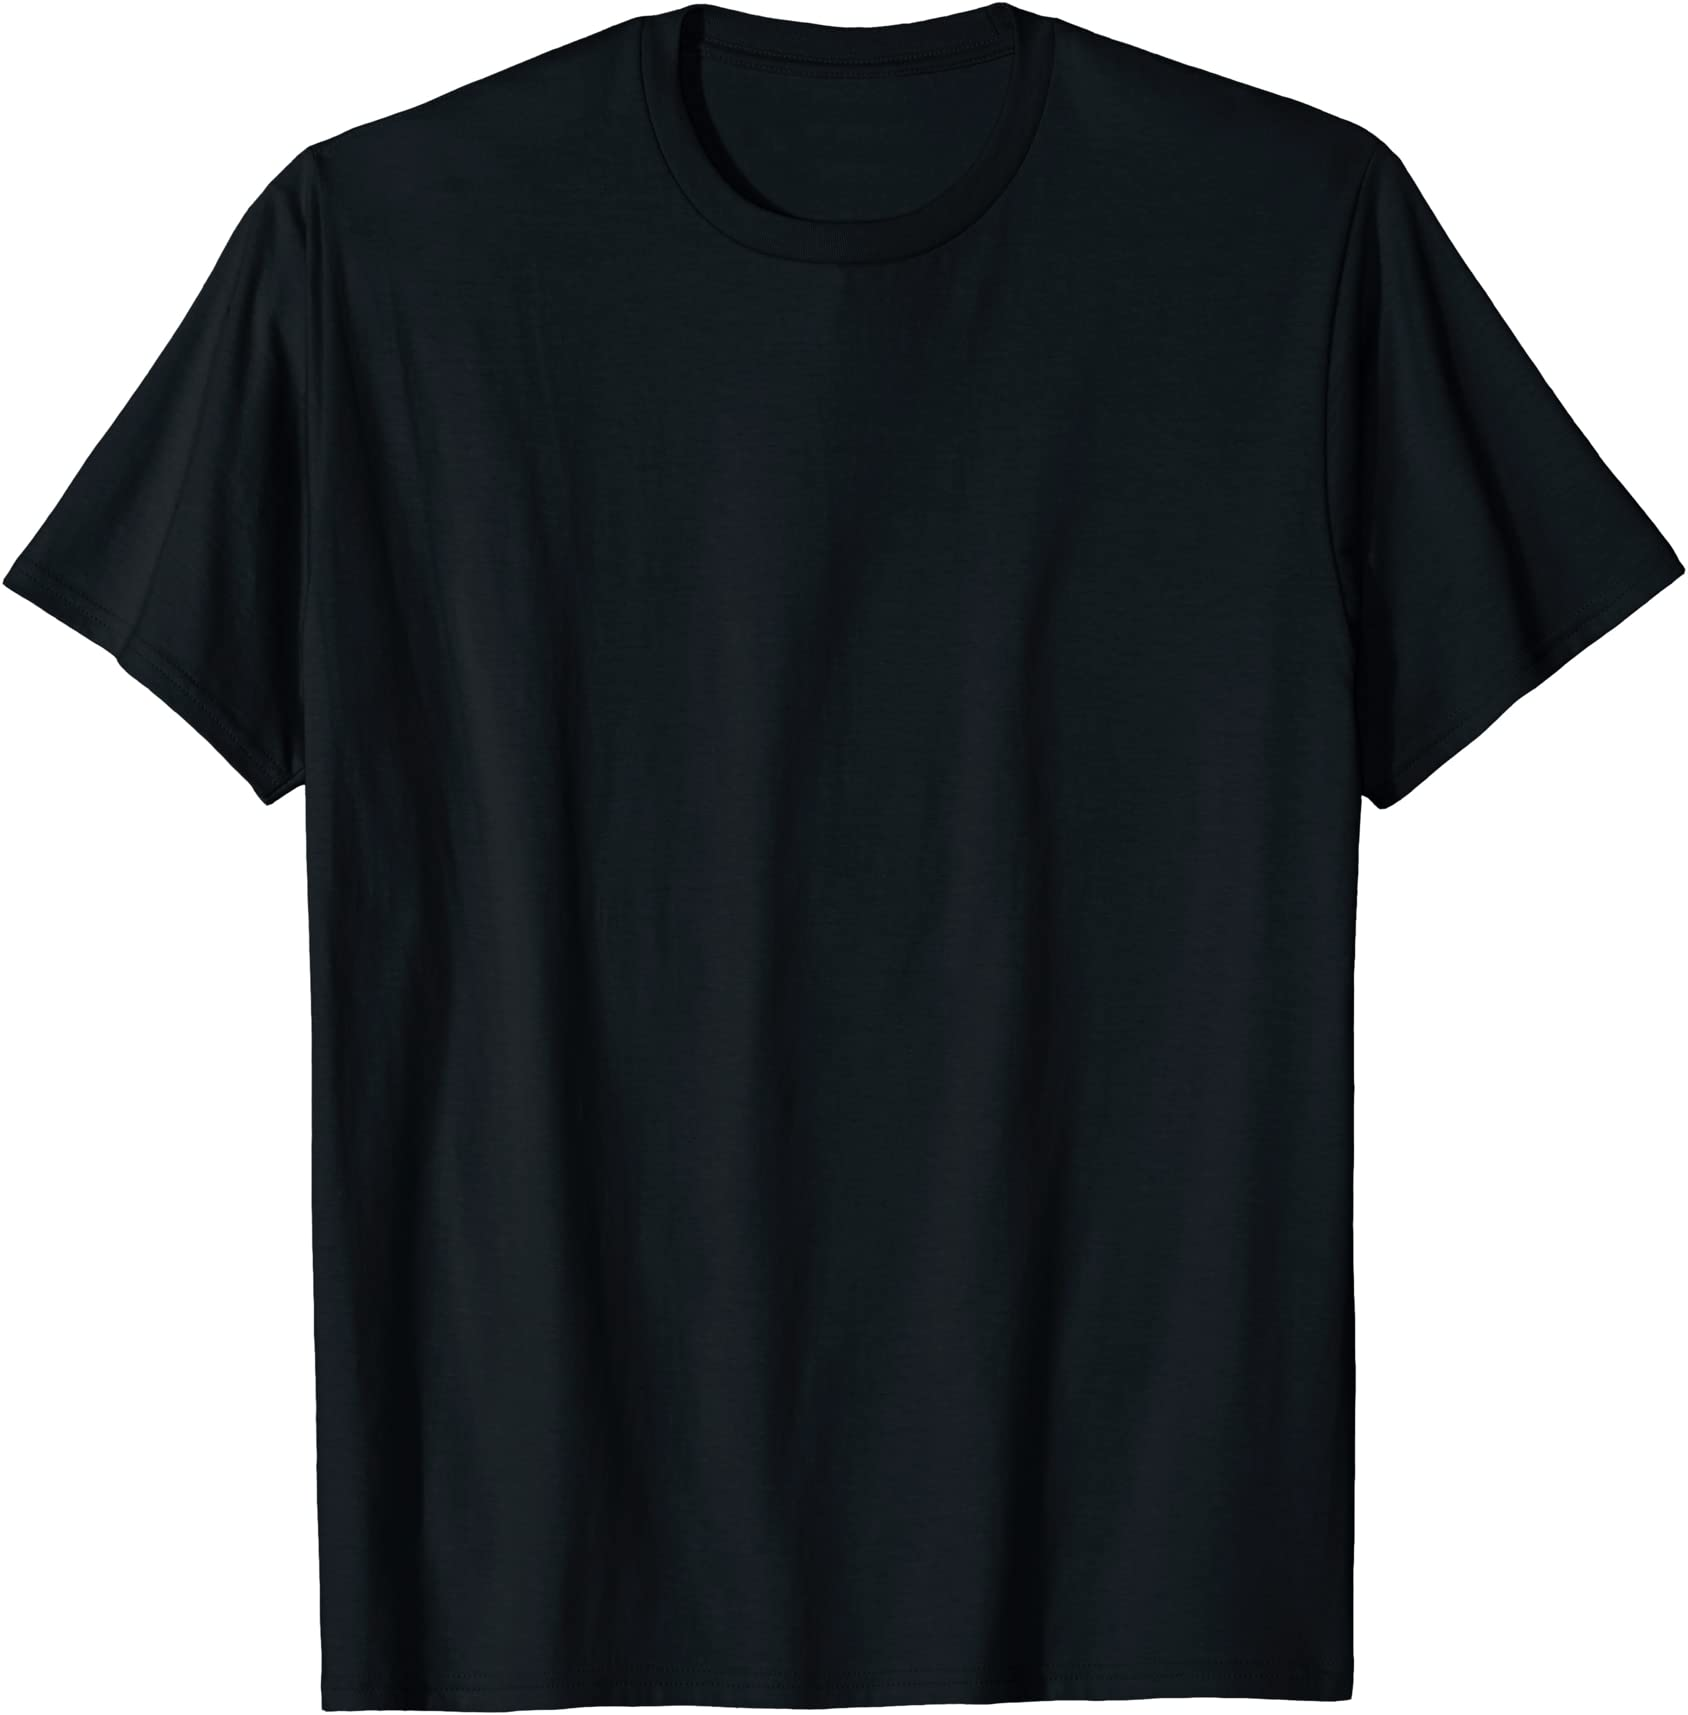 MGTOW Smoke Gray Hanes 100/% Cotton Tagless Men Going Their Own Way T-shirt